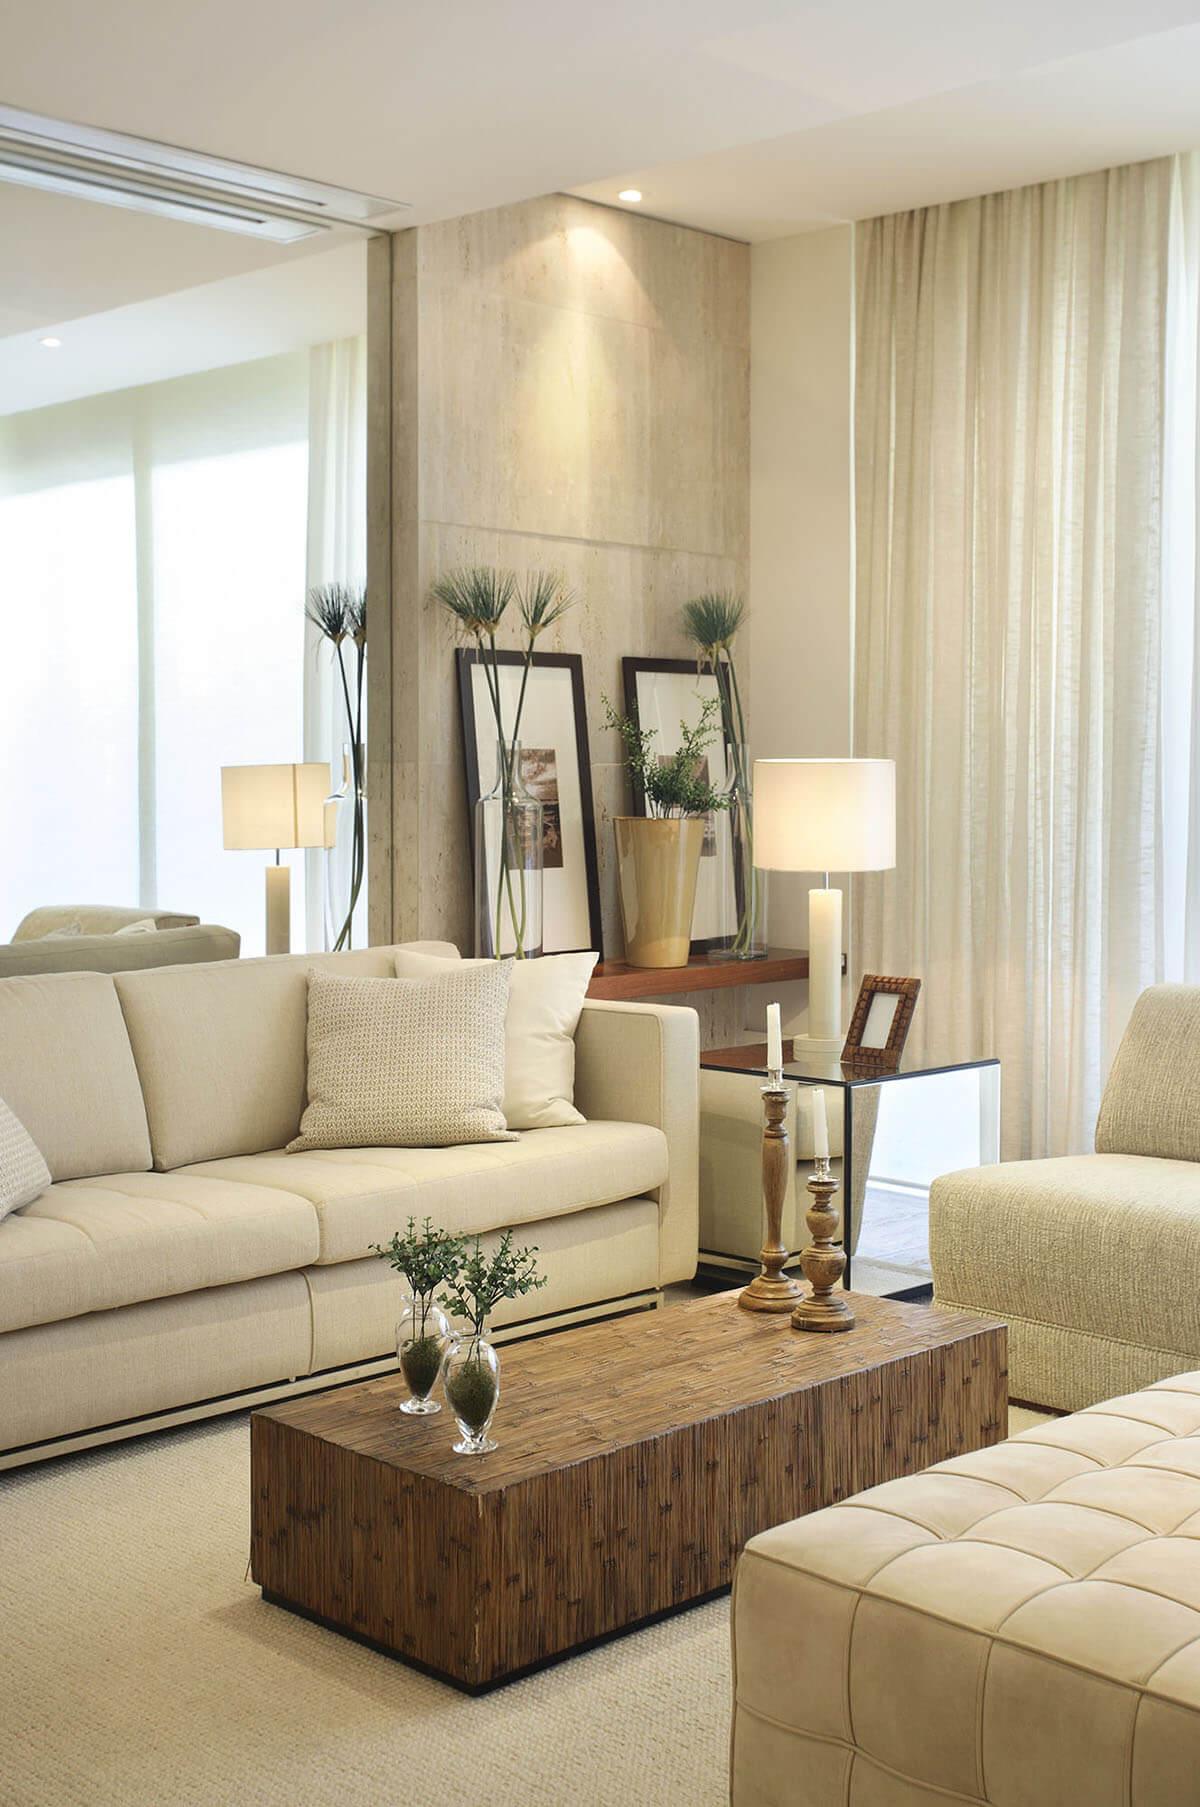 23 Best Beige Living Room Design Ideas for 2020 on Small:szwbf50Ltbw= Living Room Decor Ideas  id=47435